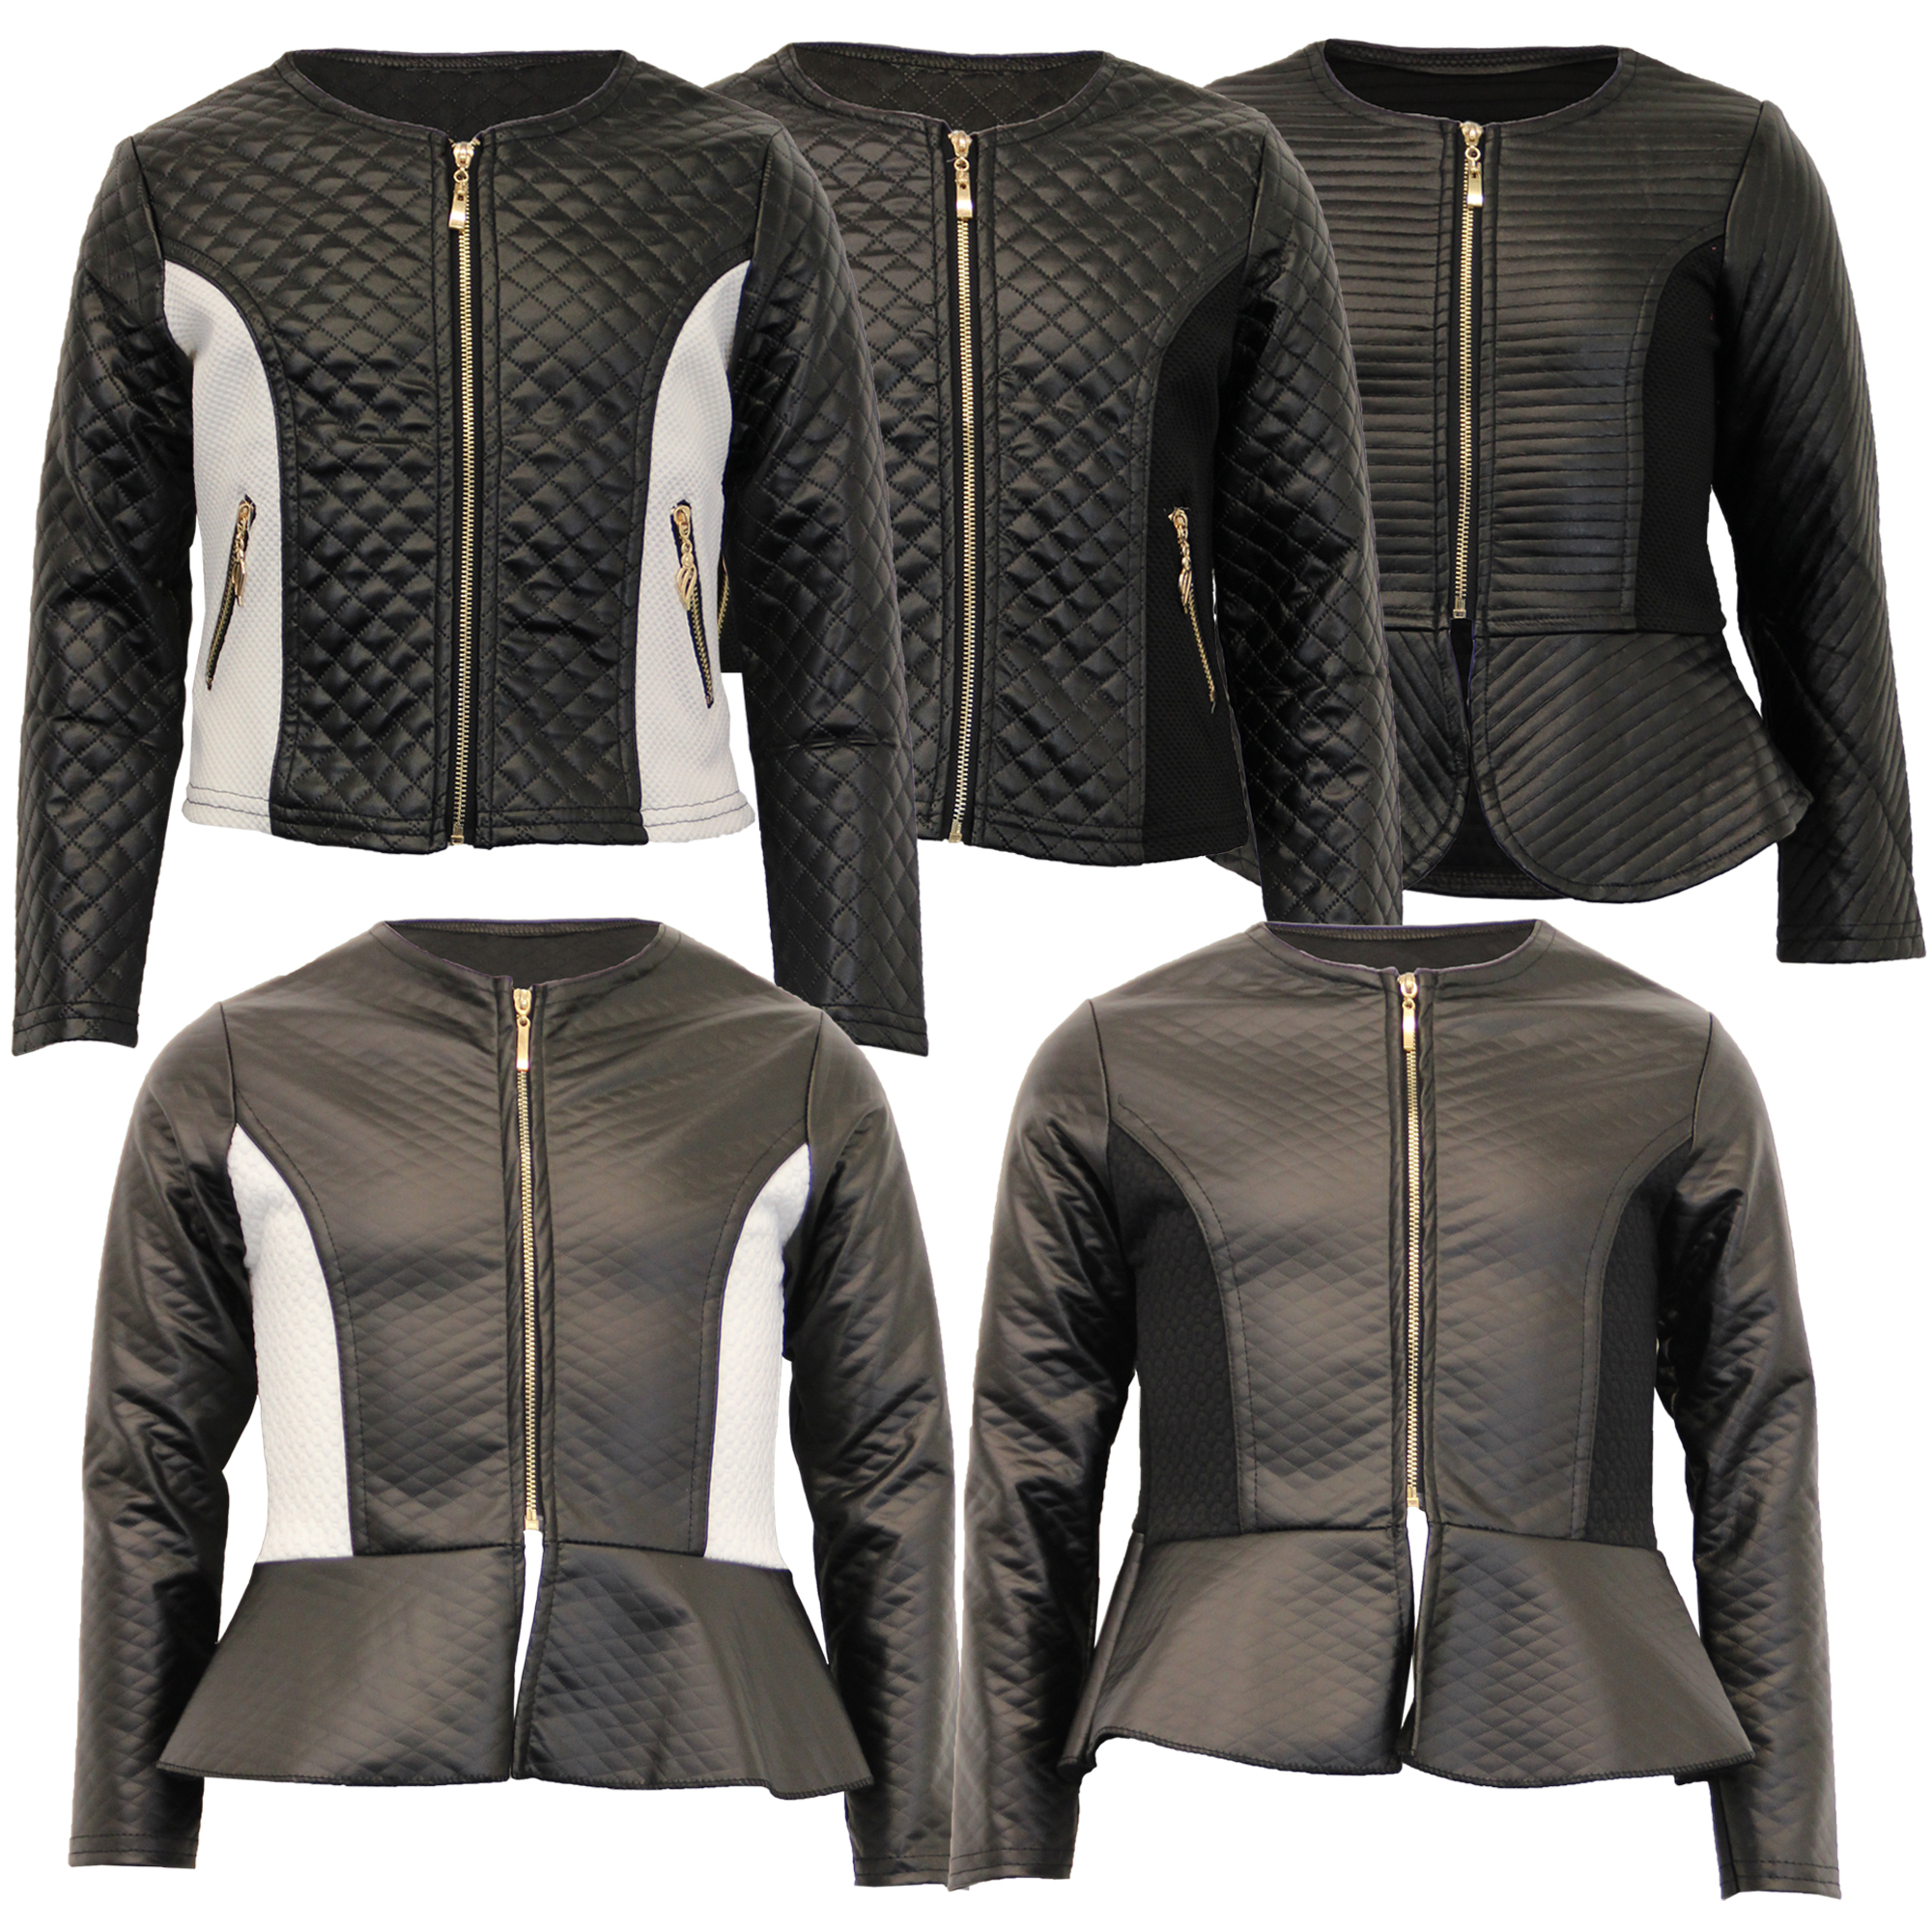 a90e0beb0c55 Girls Biker Jacket Kids Diamond Quilted PVC Leather Look Baseball ...